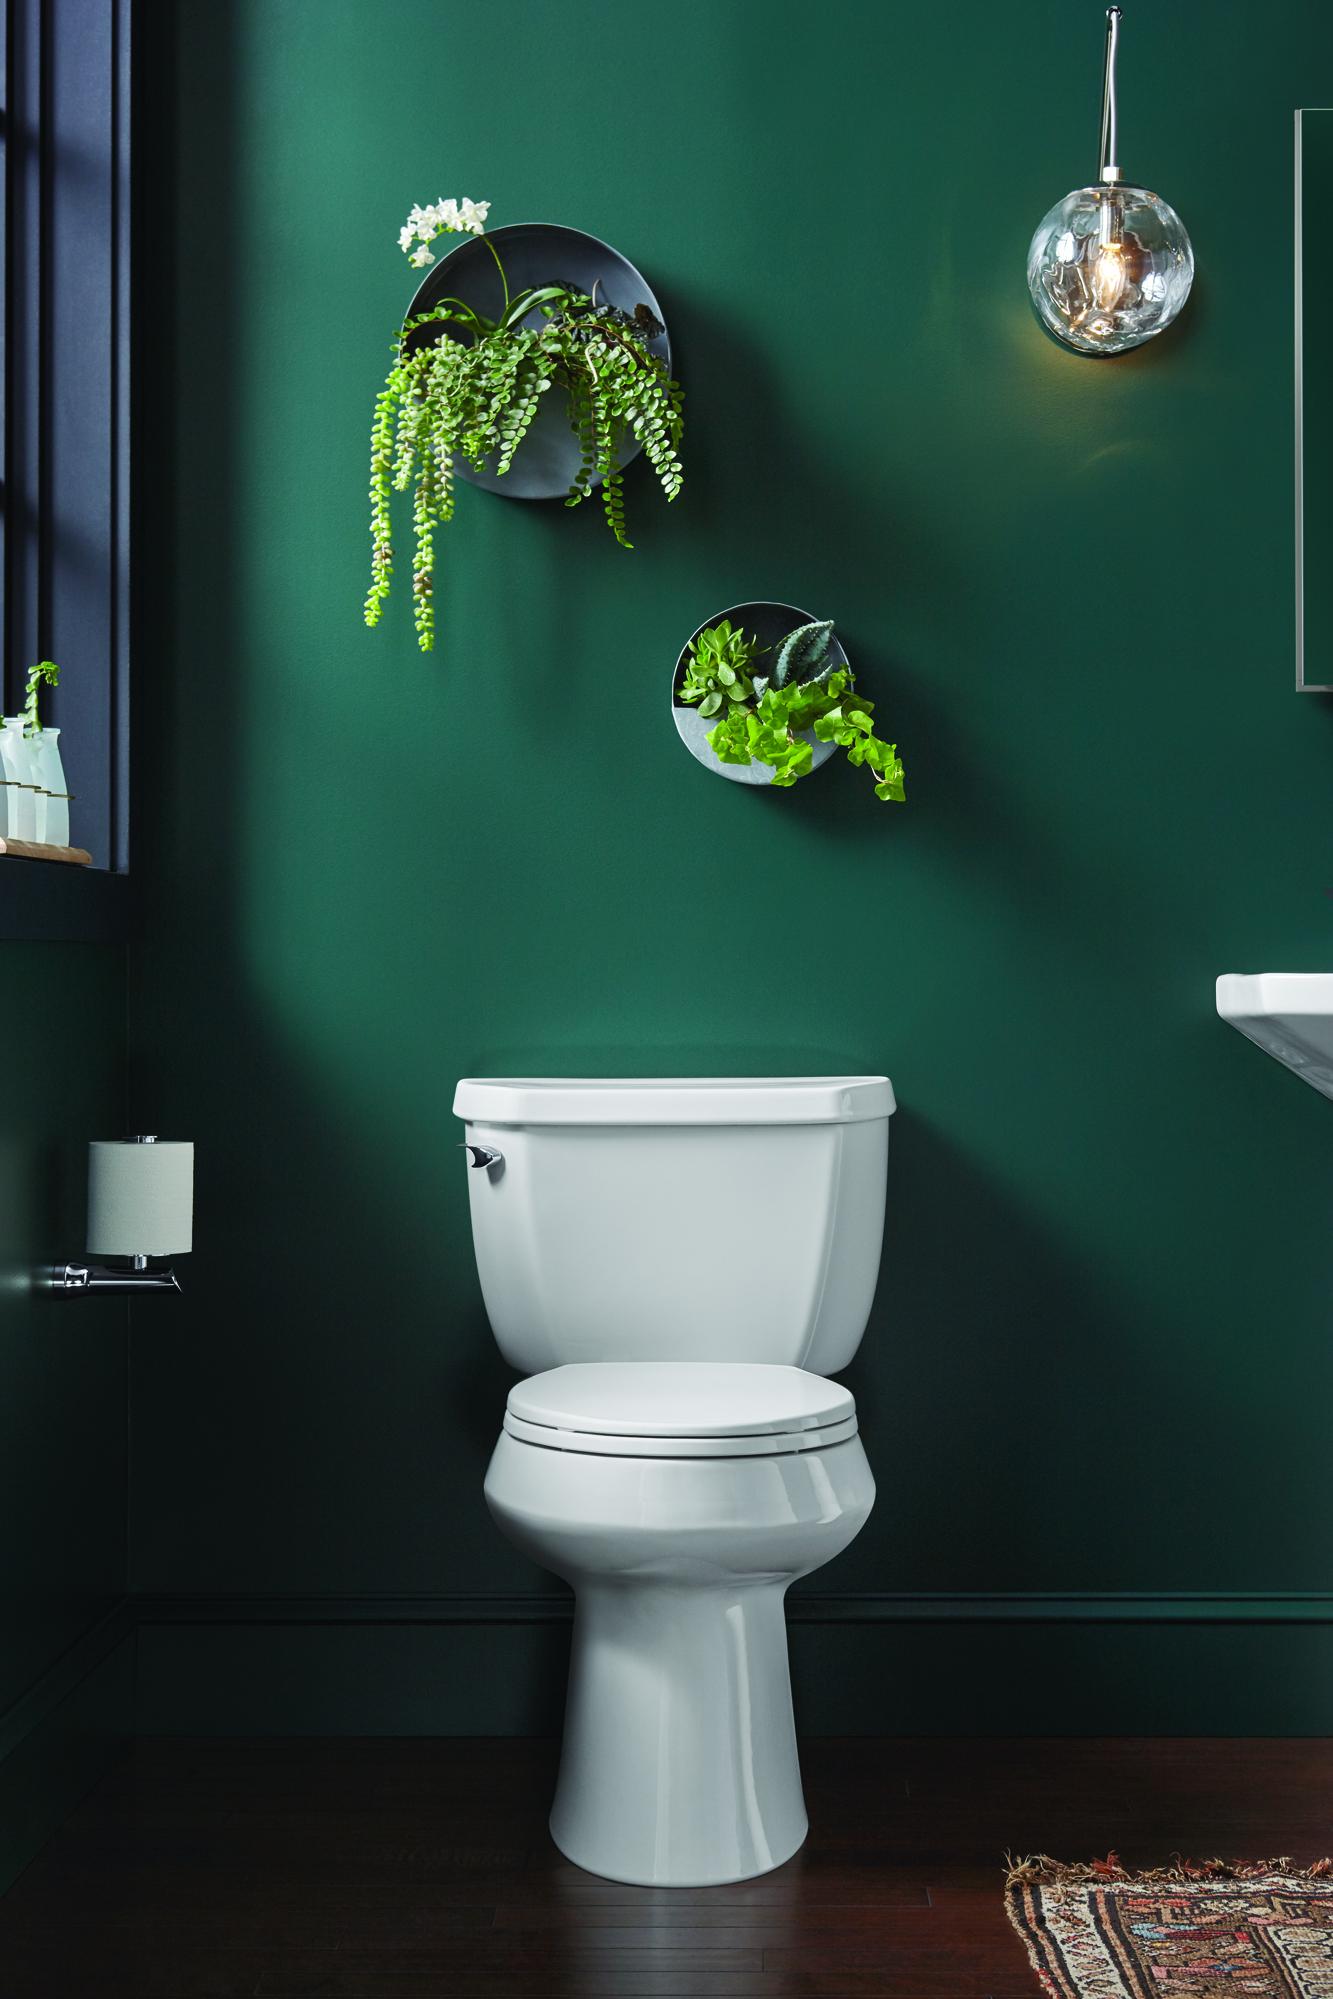 Powerful Water Miser Jlc Online Toilets Bath Water